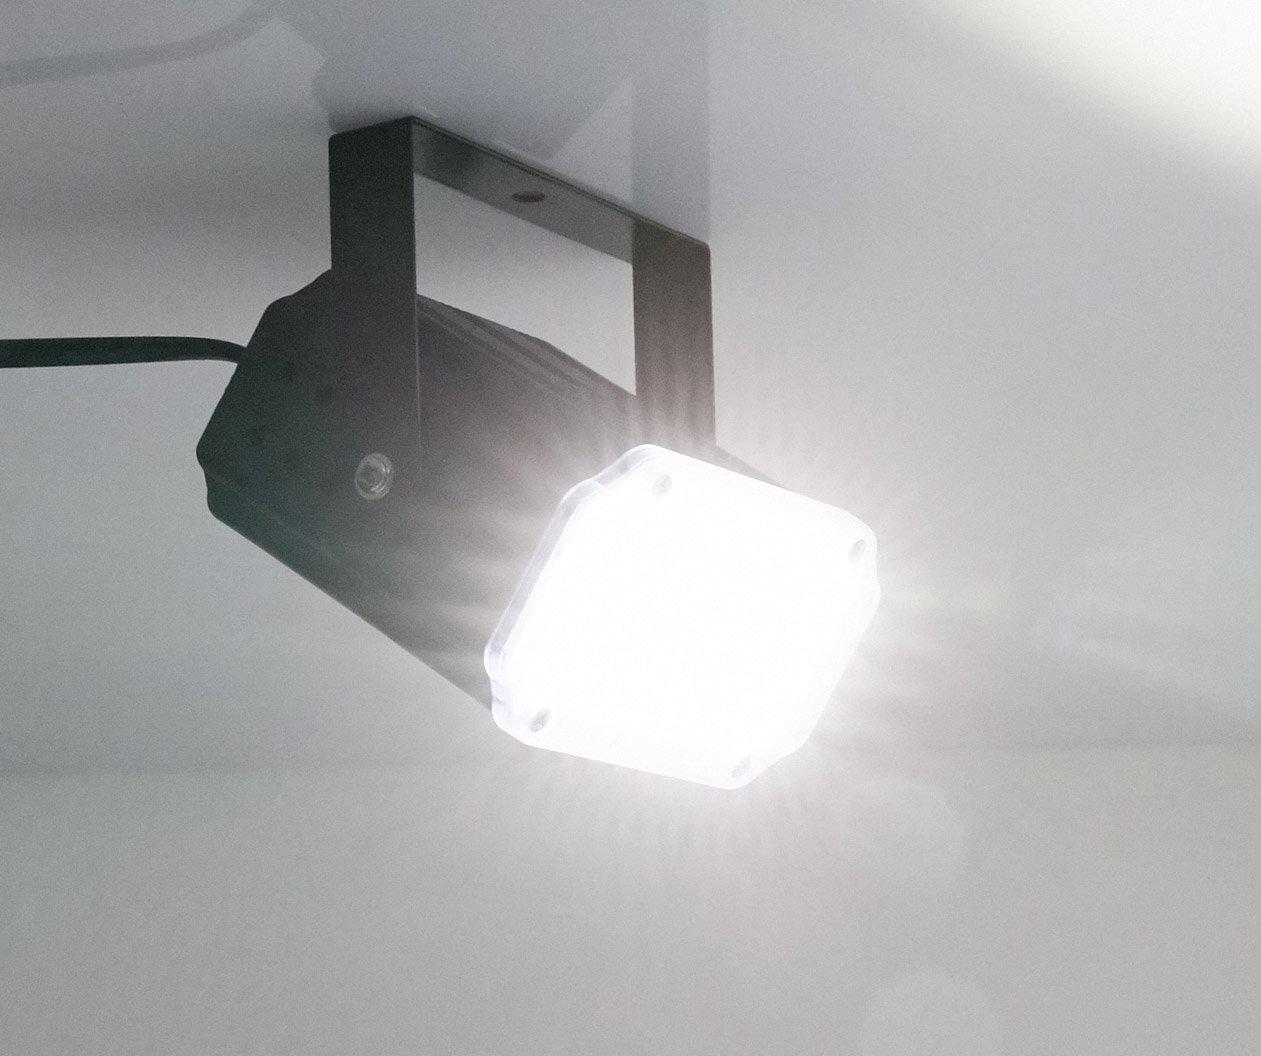 Strobe Lights, Latta Alvor Stage Light 36 LED Mini Disco LIghts Flash Strobe Lighting with Sound Activated and Speed Control for Party Wedding DJ Disco KTV Bars Lights (white) by Latta Alvor